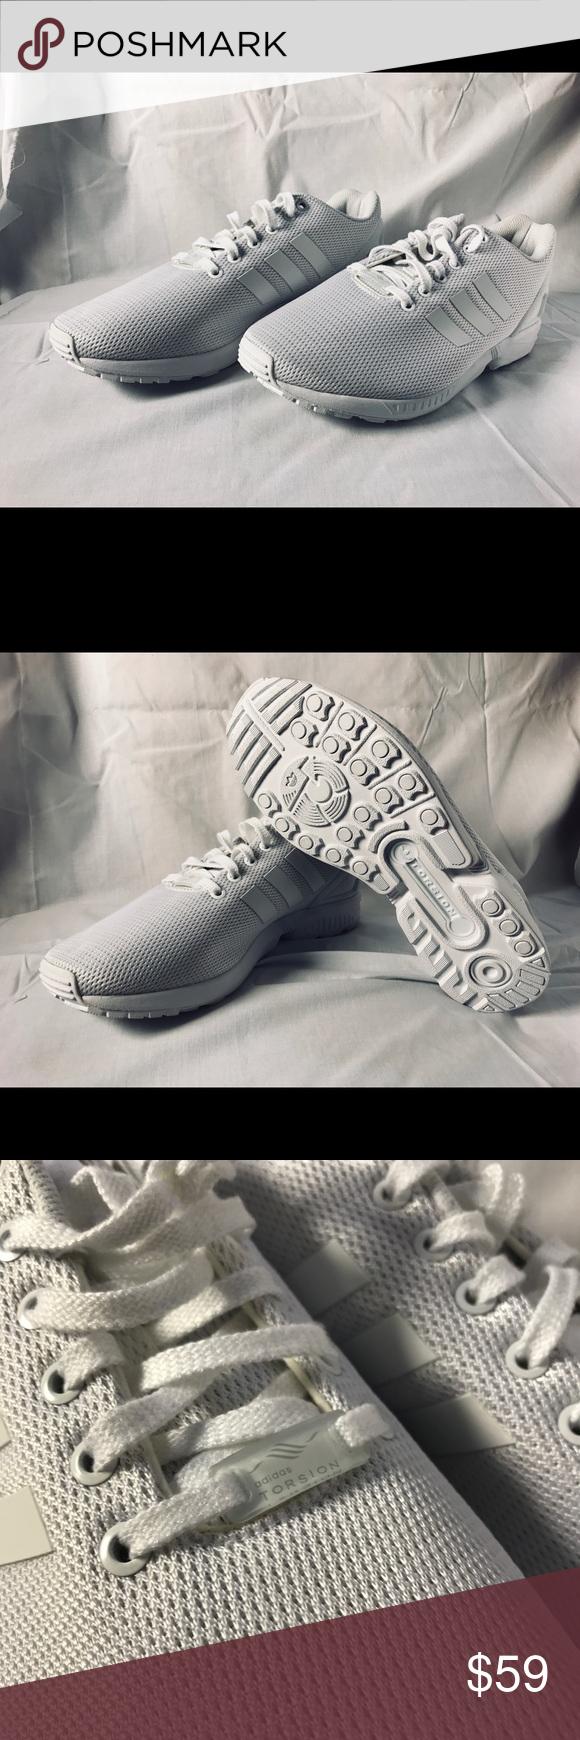 adidas zx flusso nuovo senza scatola